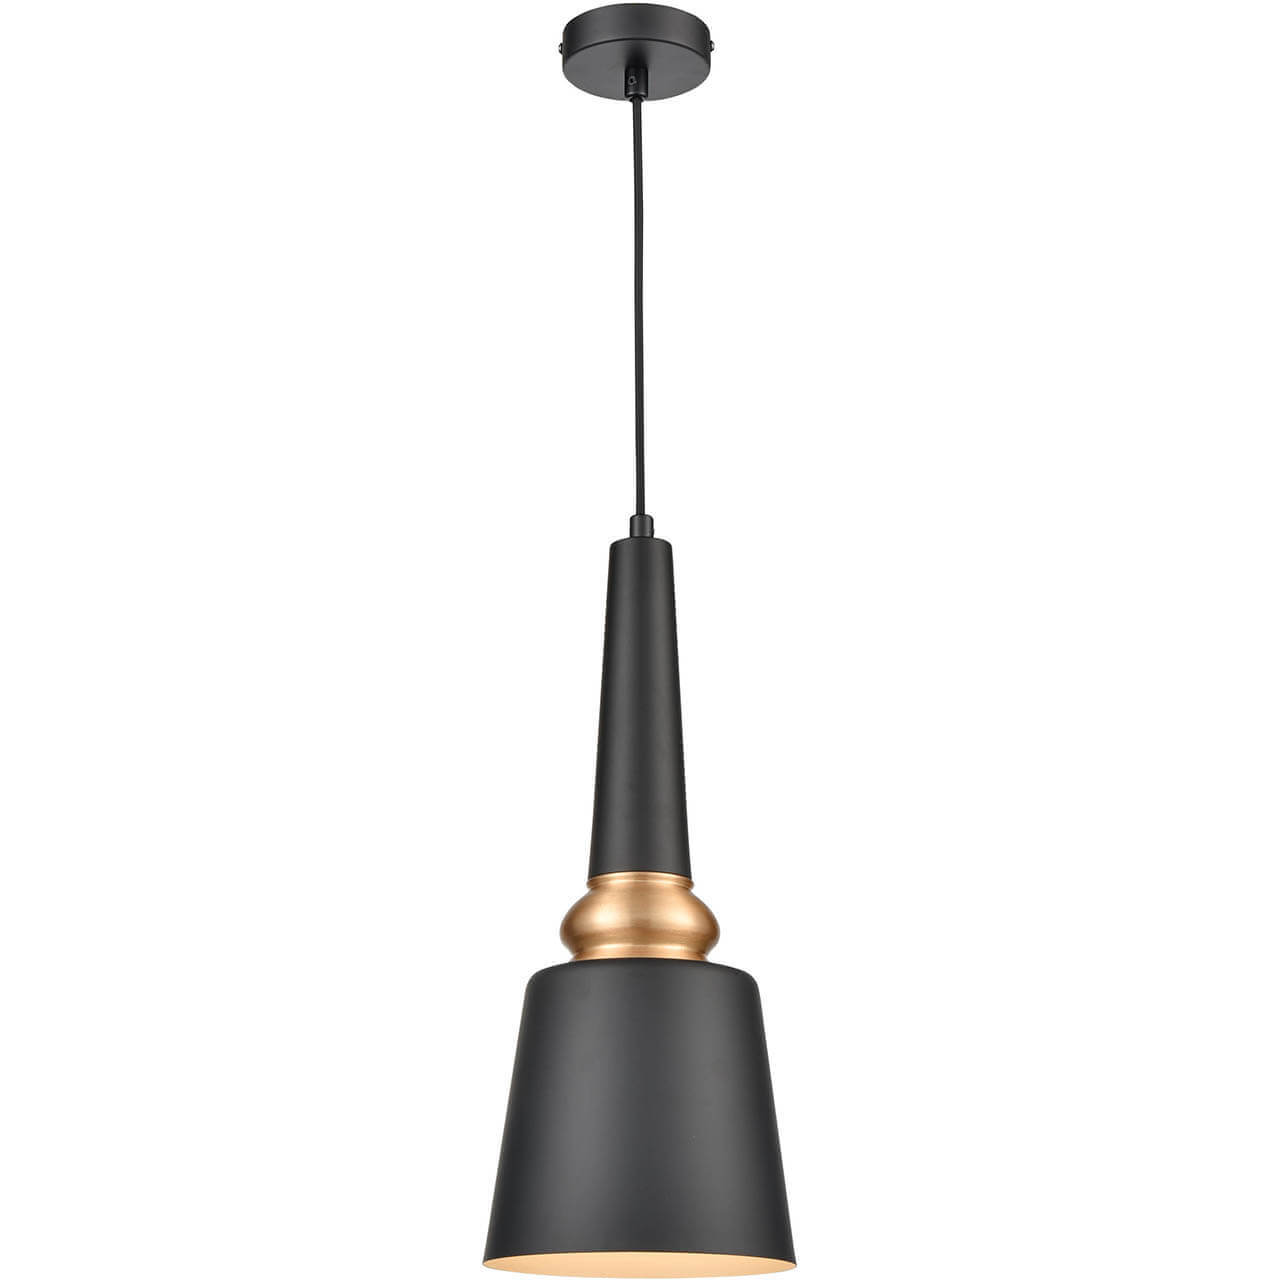 Подвесной светильник Vele Luce Appassionato VL2142P01 le vele 1 5 сп gullu 7722